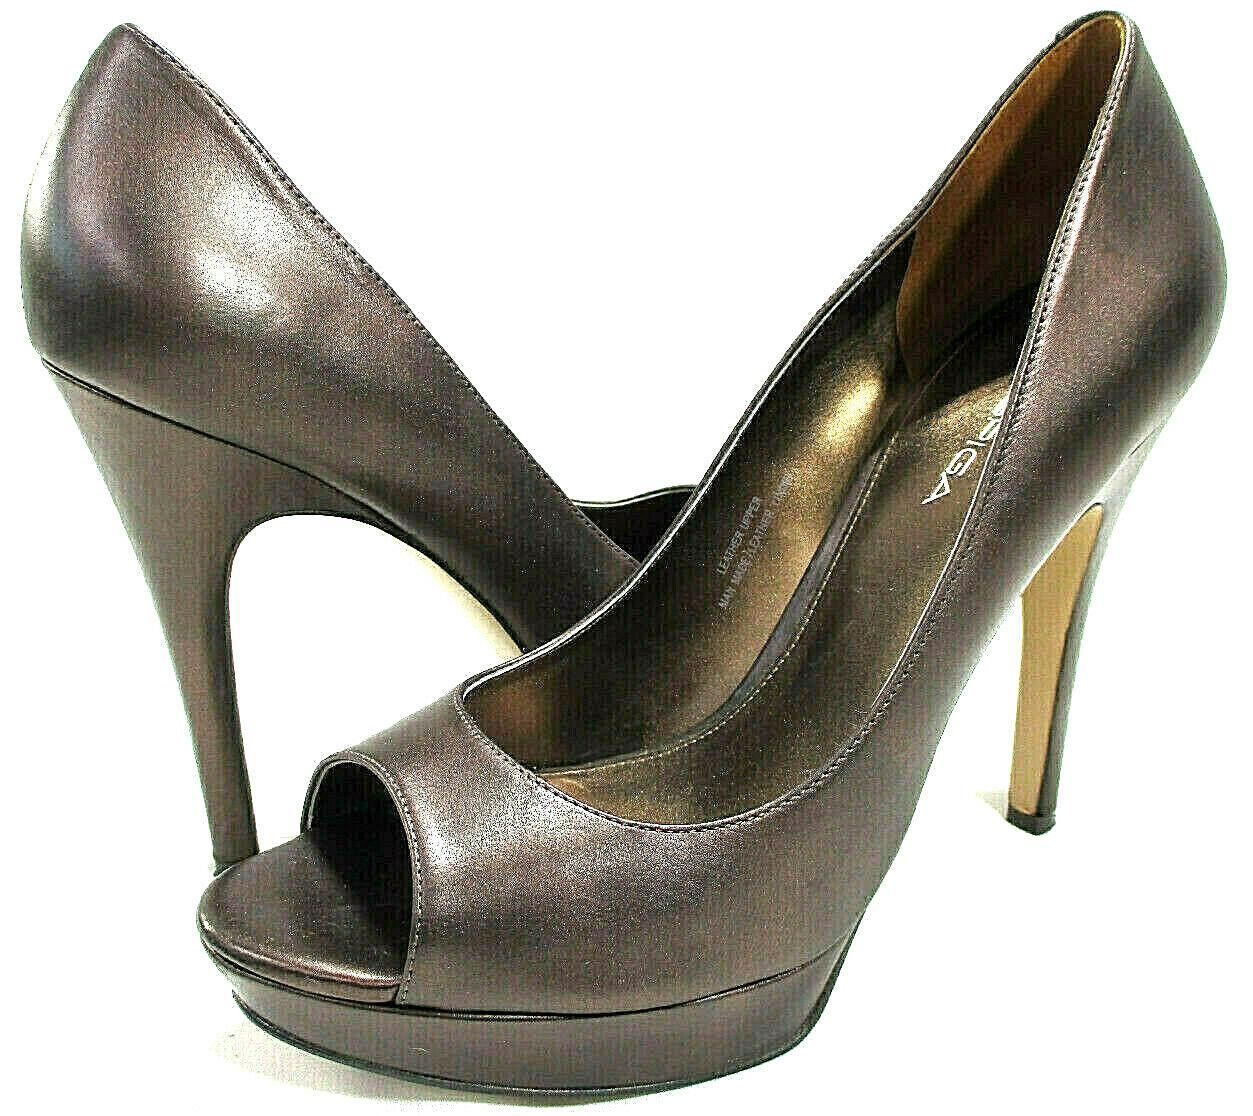 VIA SPIGA Copper Metallic Leather Peep Toe Platform Pumps  325  Women's Sz 9.5 M